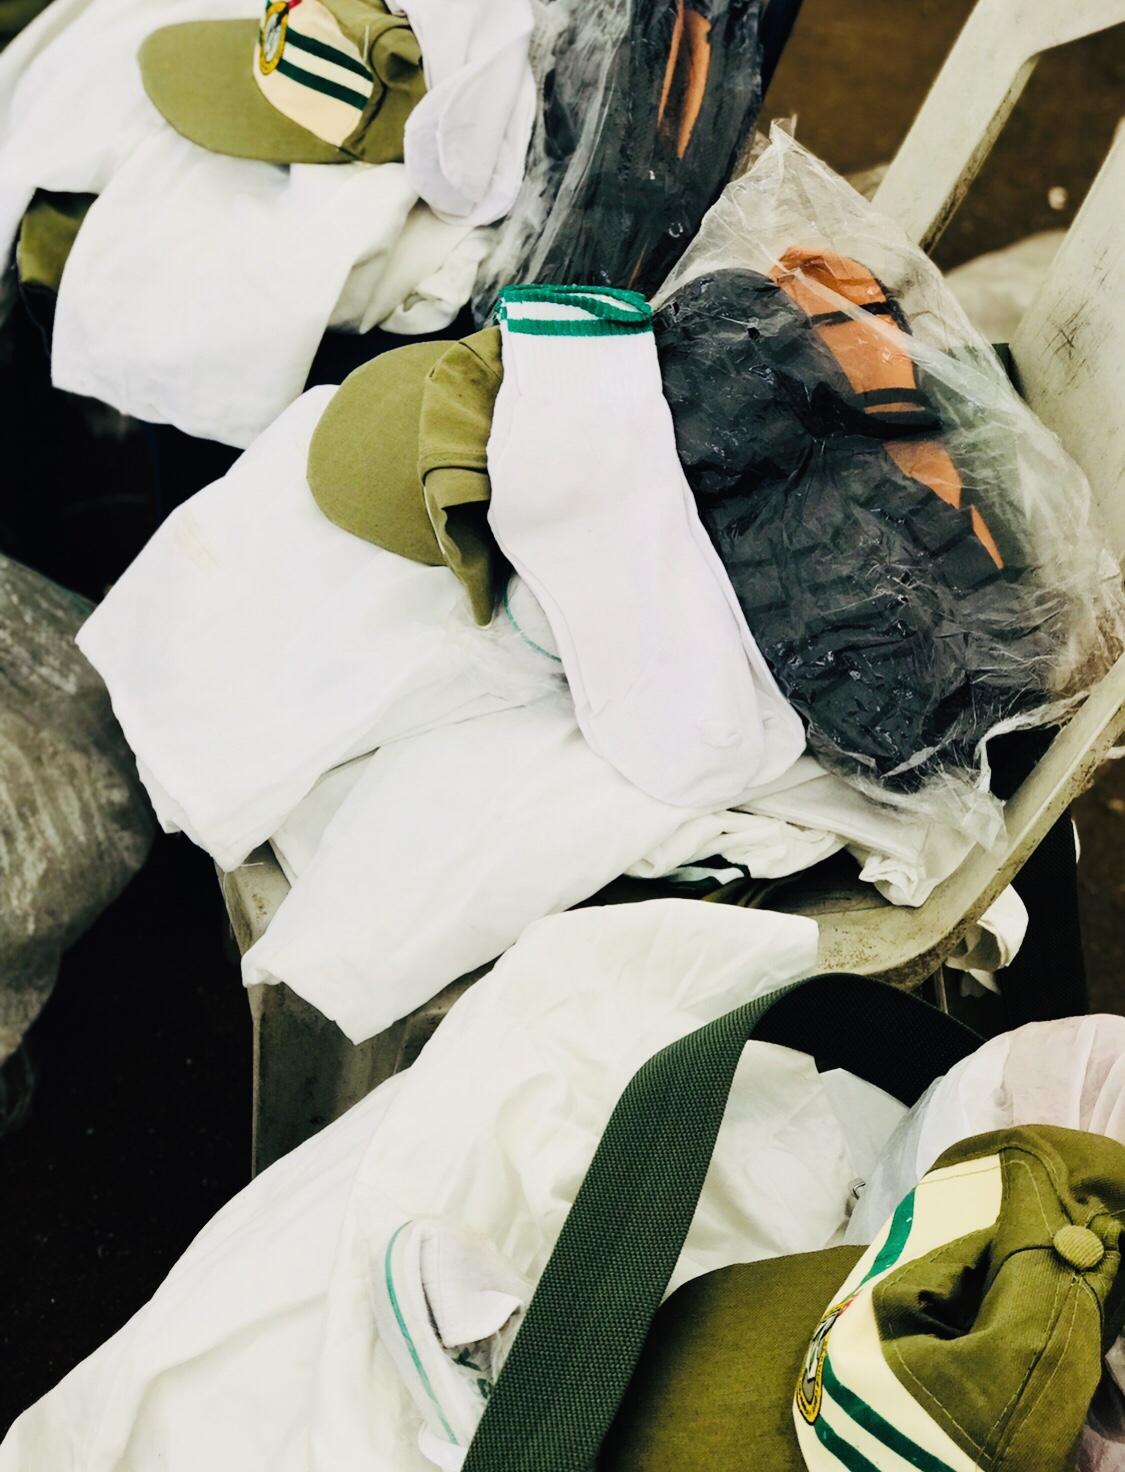 NYSC uniform in full